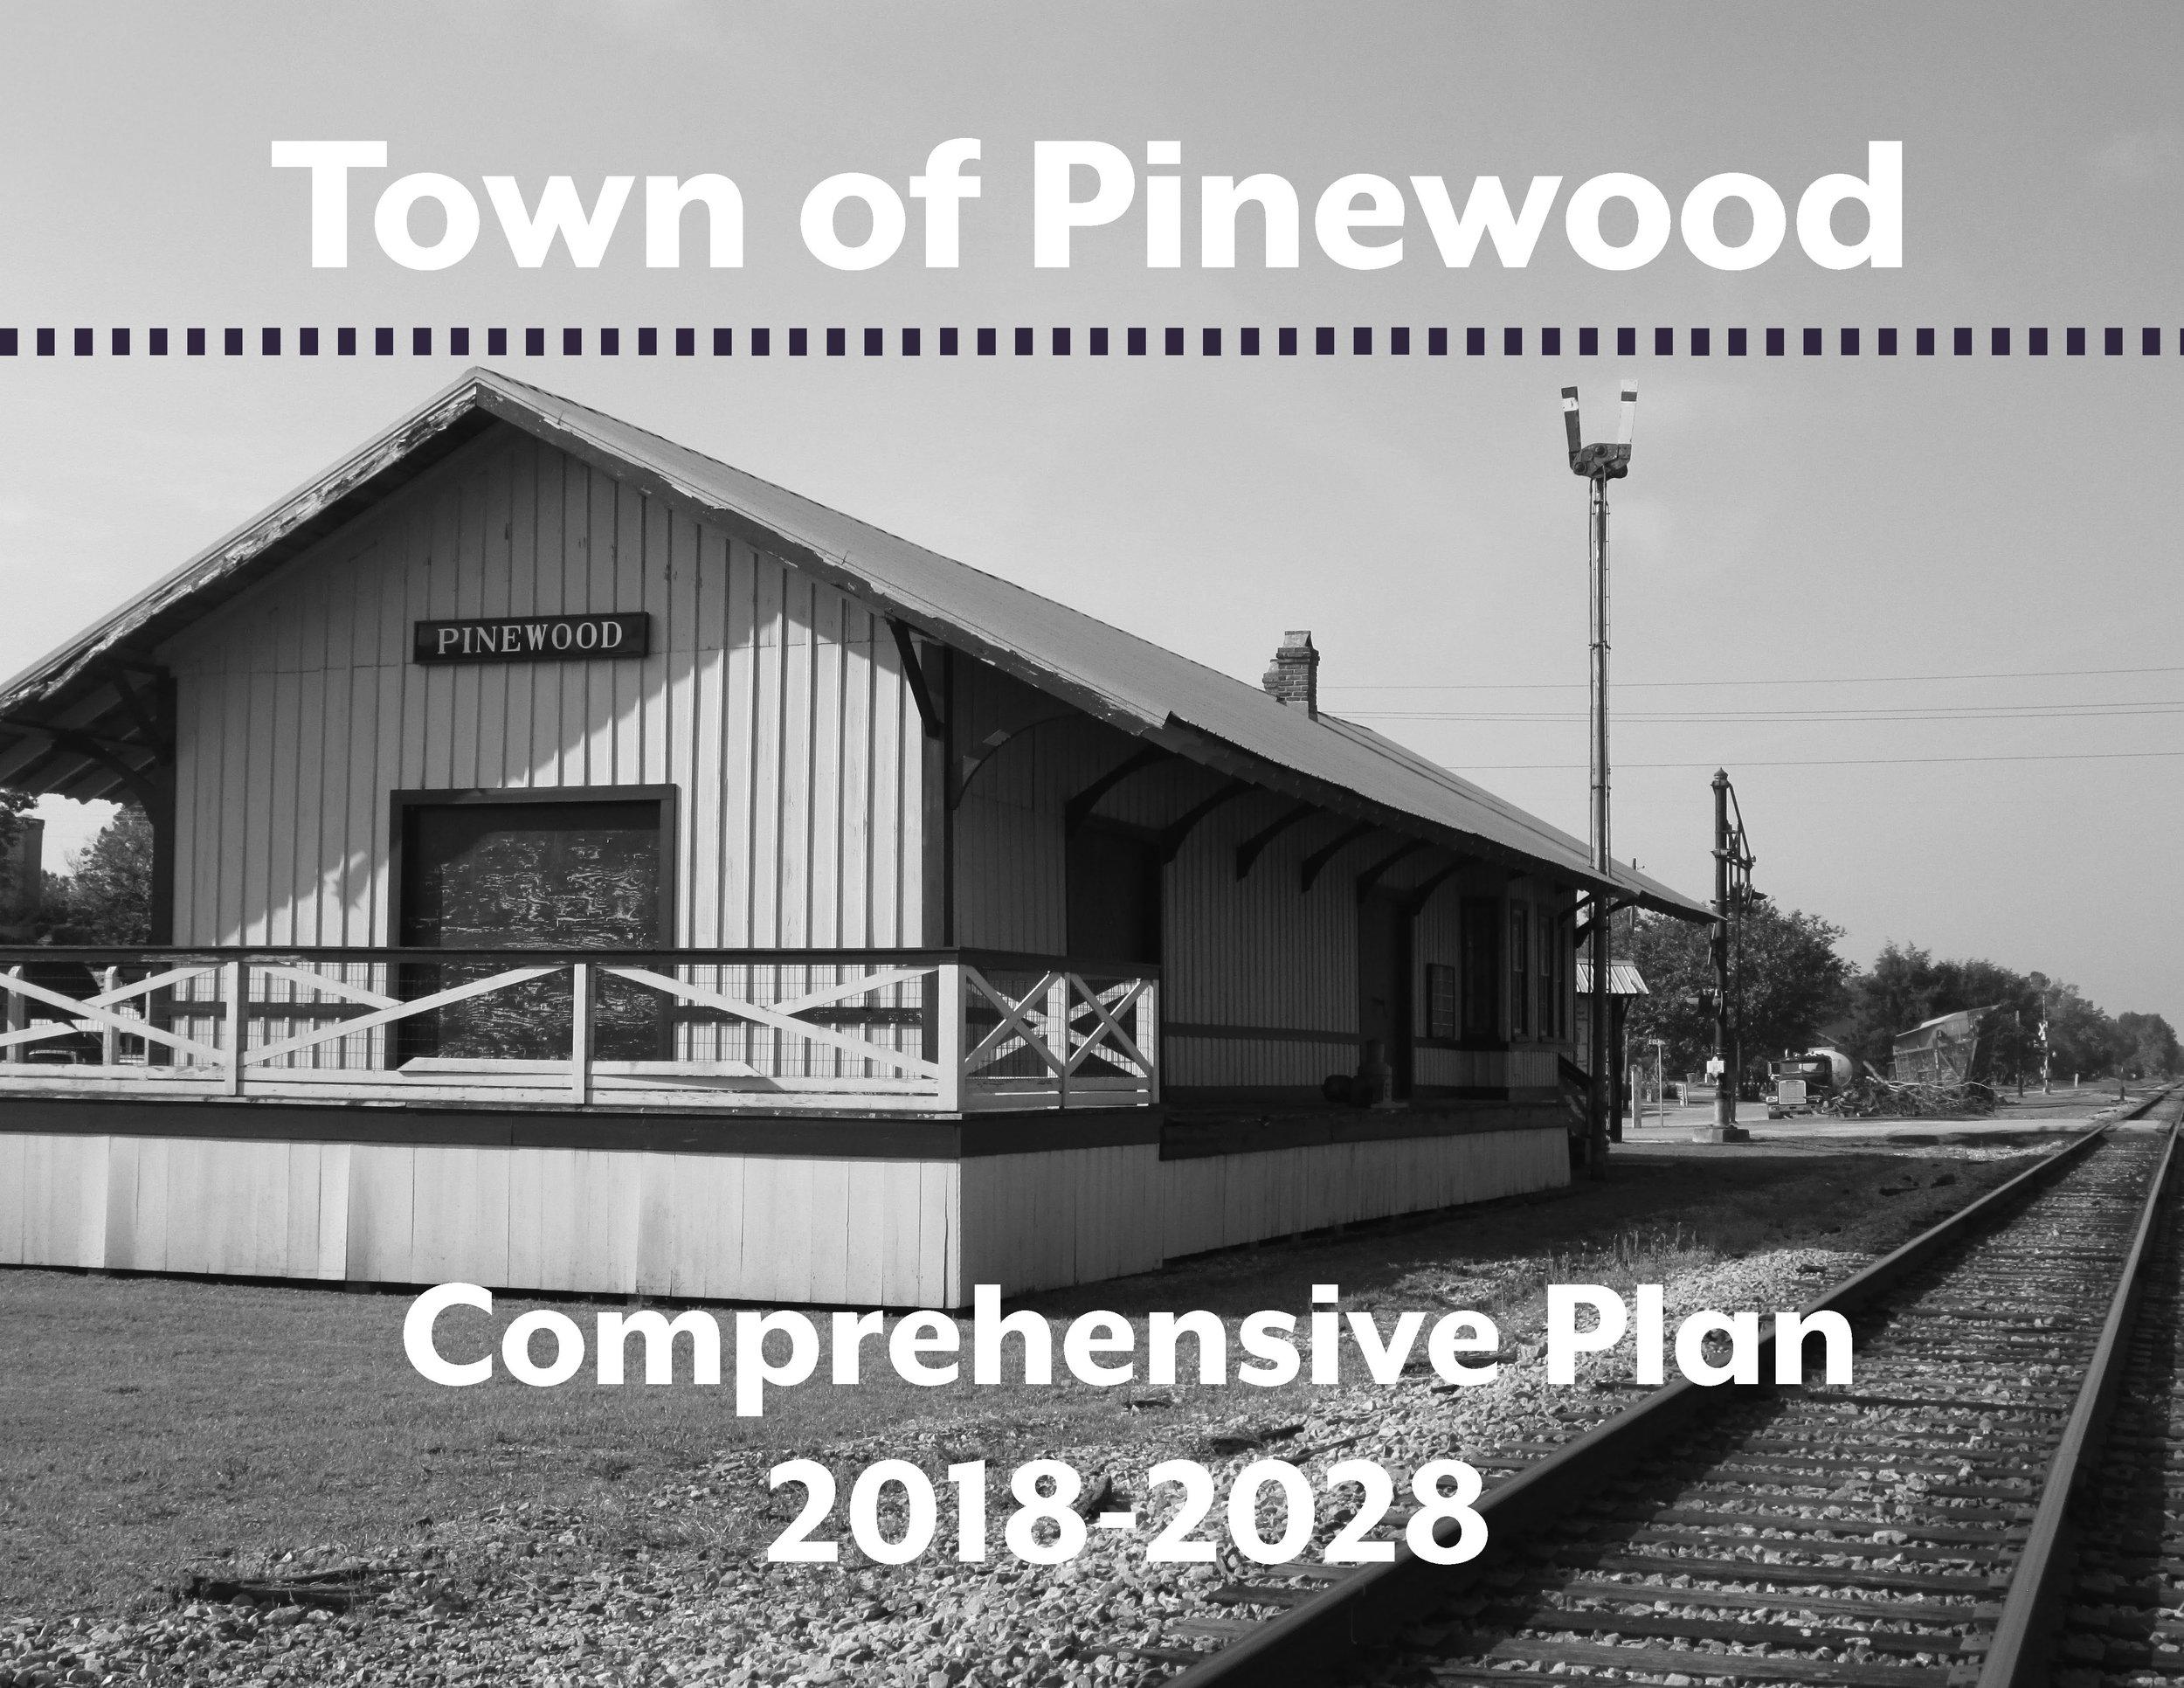 Pinewood Comp Plan Cover.jpg